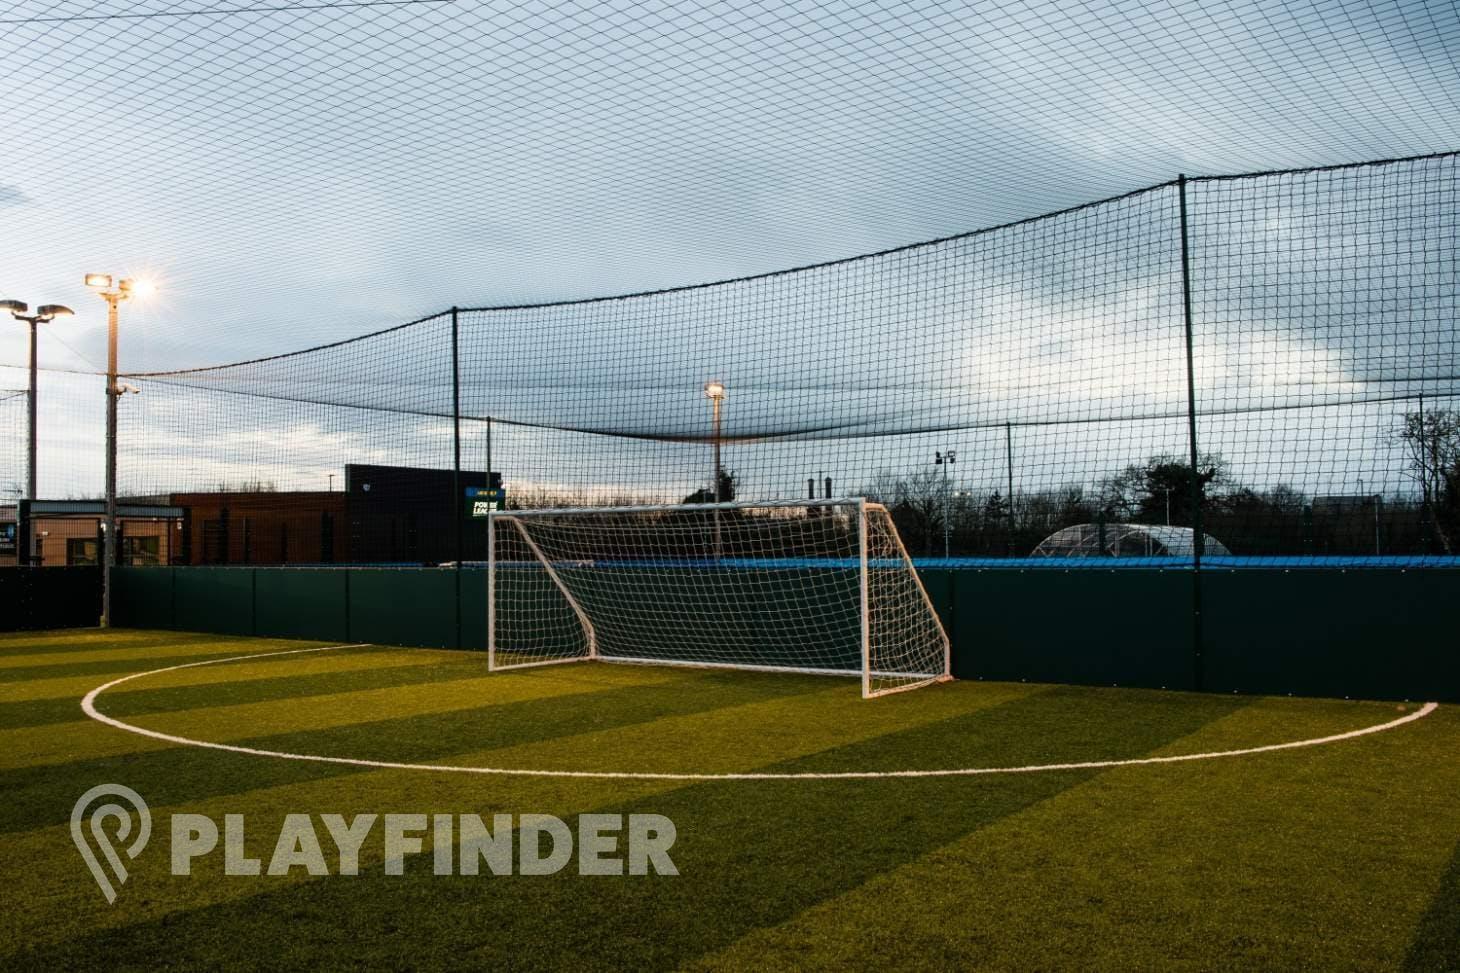 Powerleague Luton 7 a side   3G Astroturf football pitch